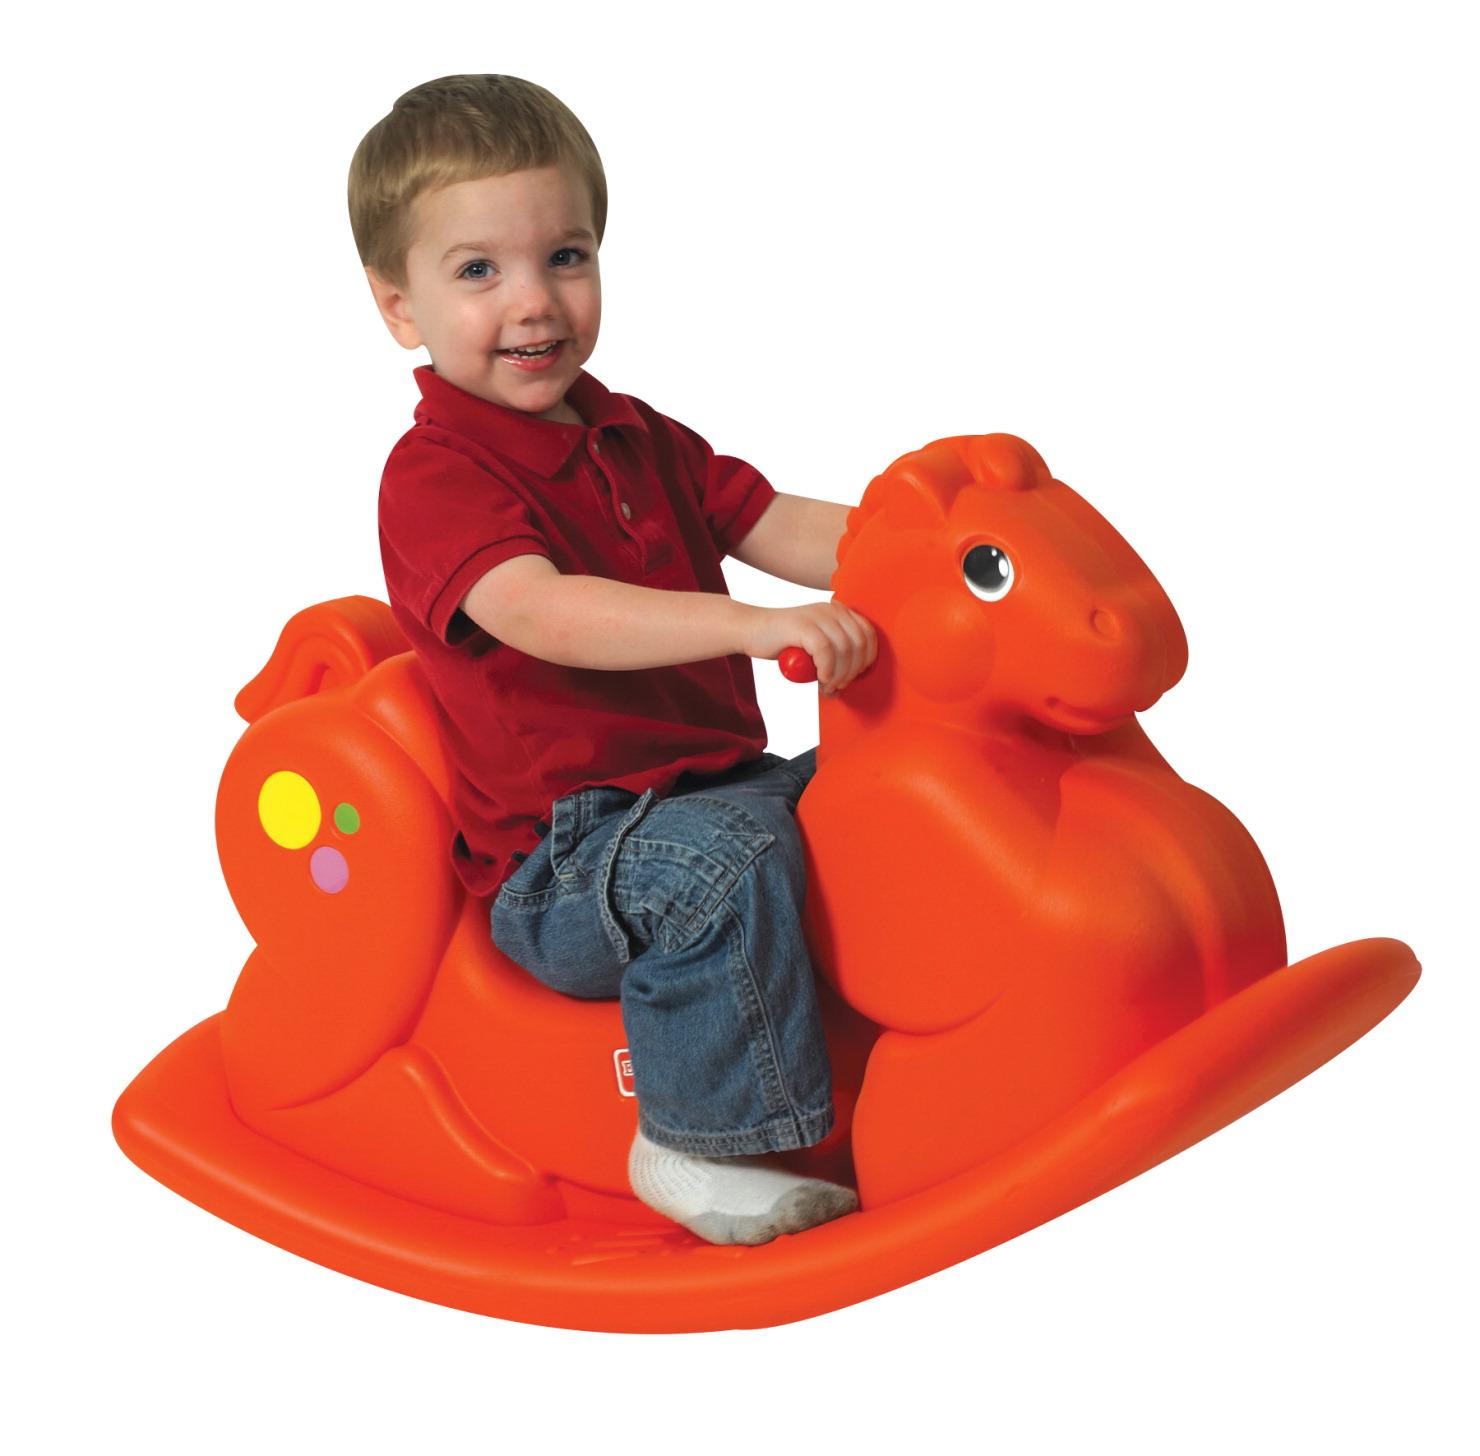 Riding Toys Age 5 : Children s factory rocking horse orange school